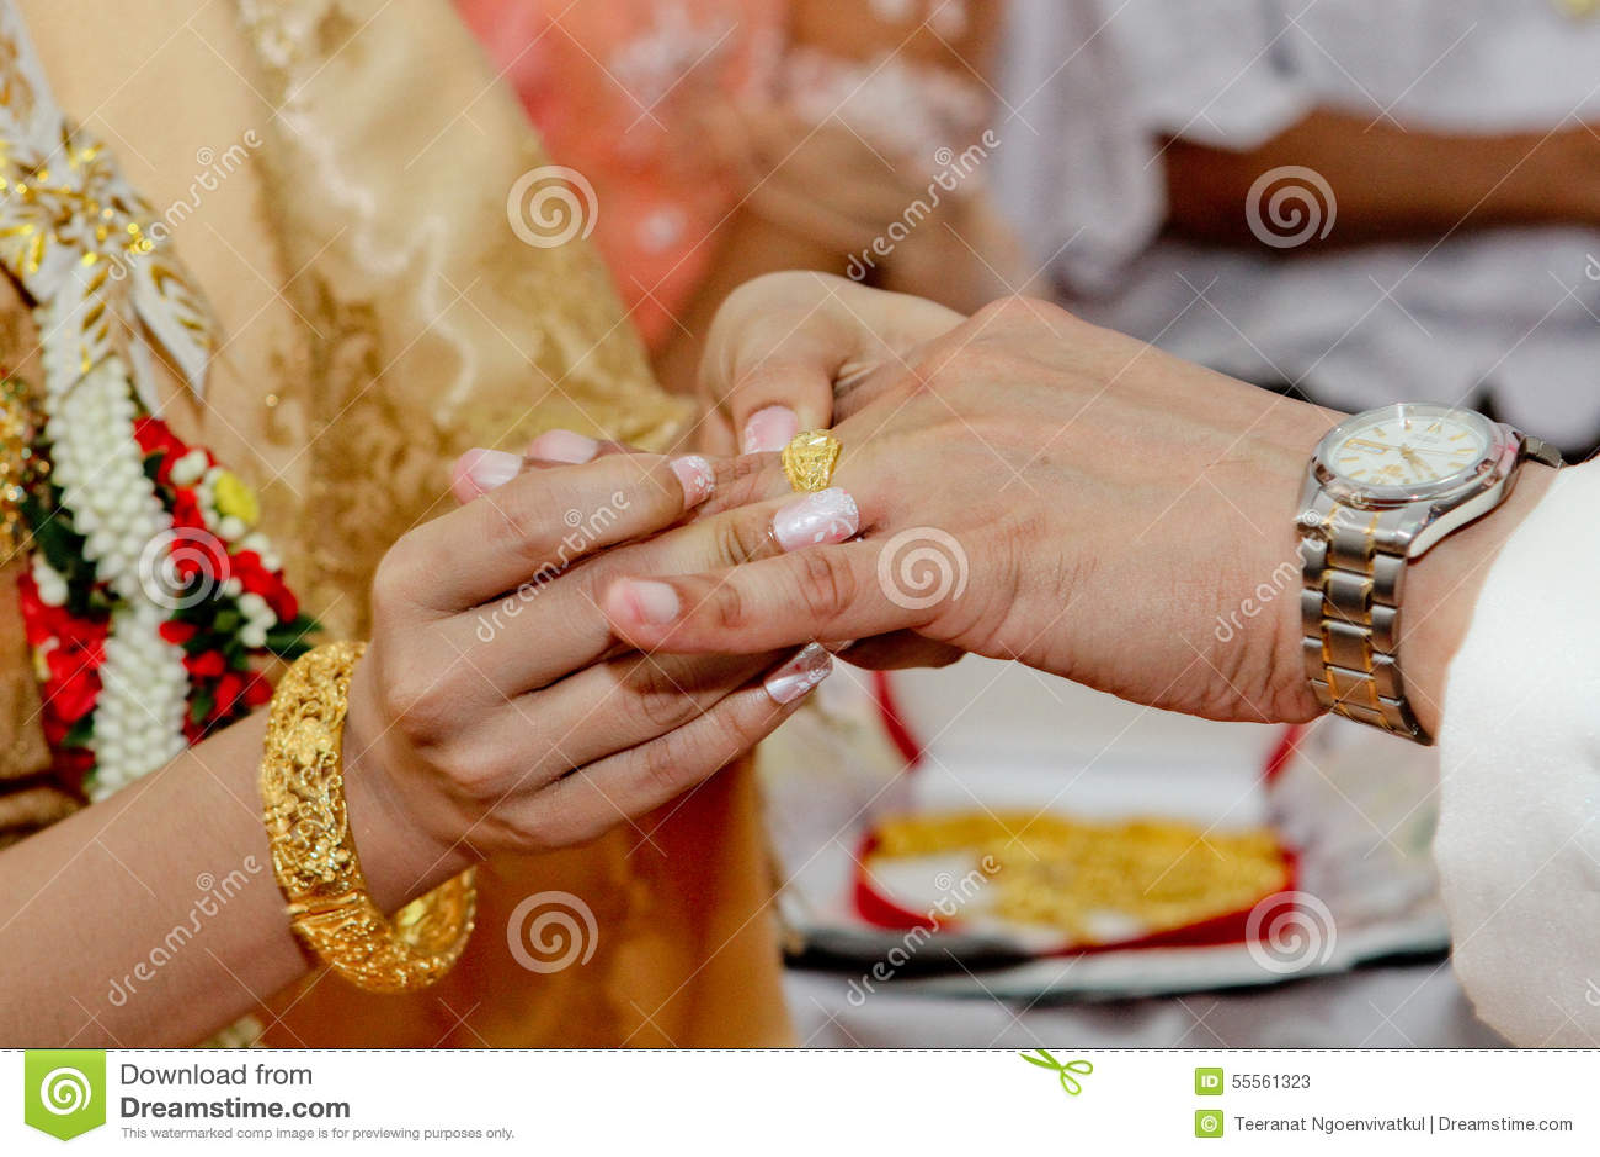 Wedding Rings Pictures thai customs wedding rings